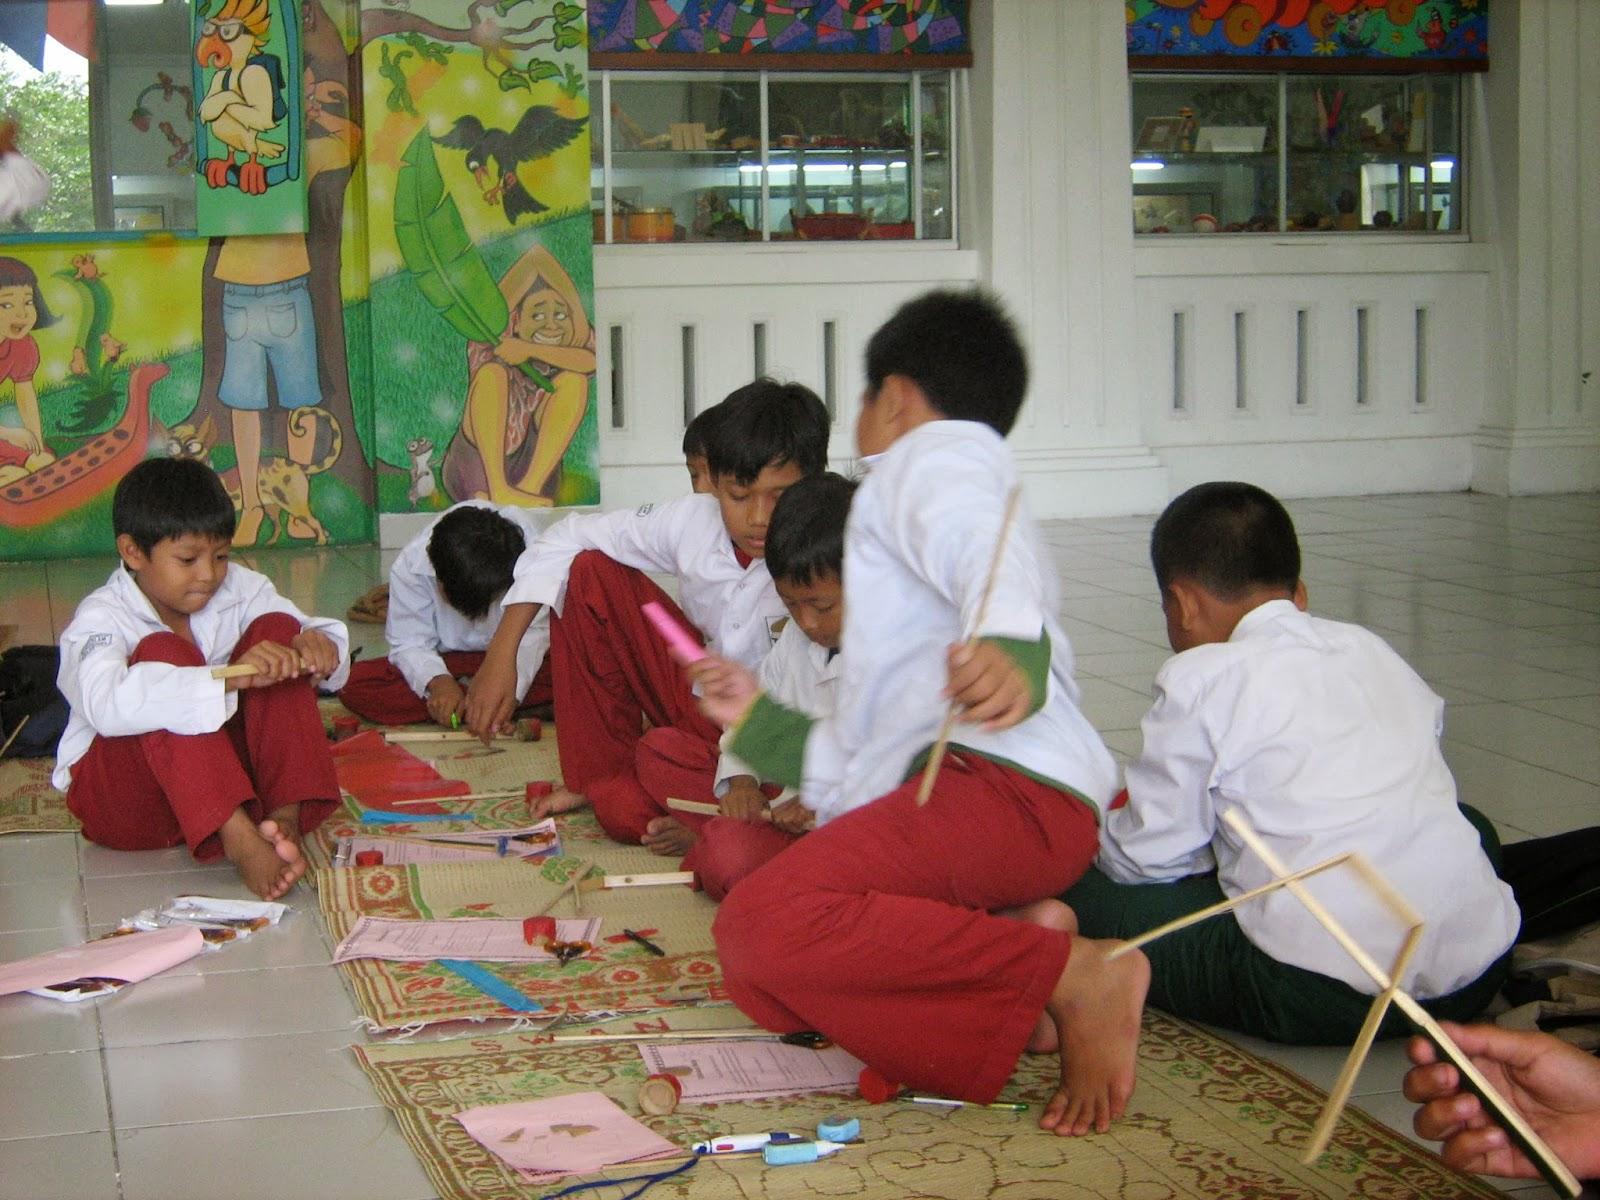 Pengunjung museum didominasi usia anak sekolah (http://kolongtangga.blogspot.co.id/)